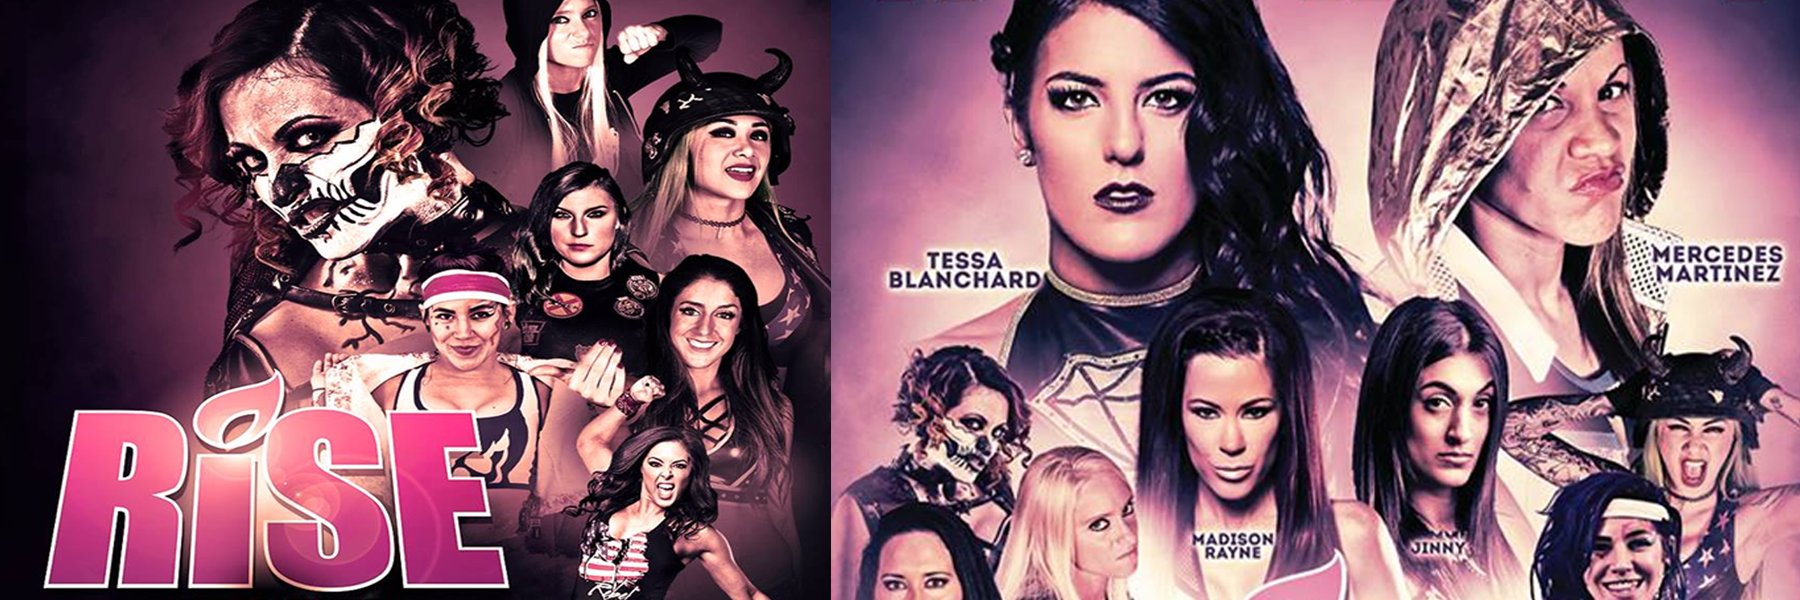 Watch the best RISE Women's Wrestling: Tessa Blanchard, Mercedes Martinez